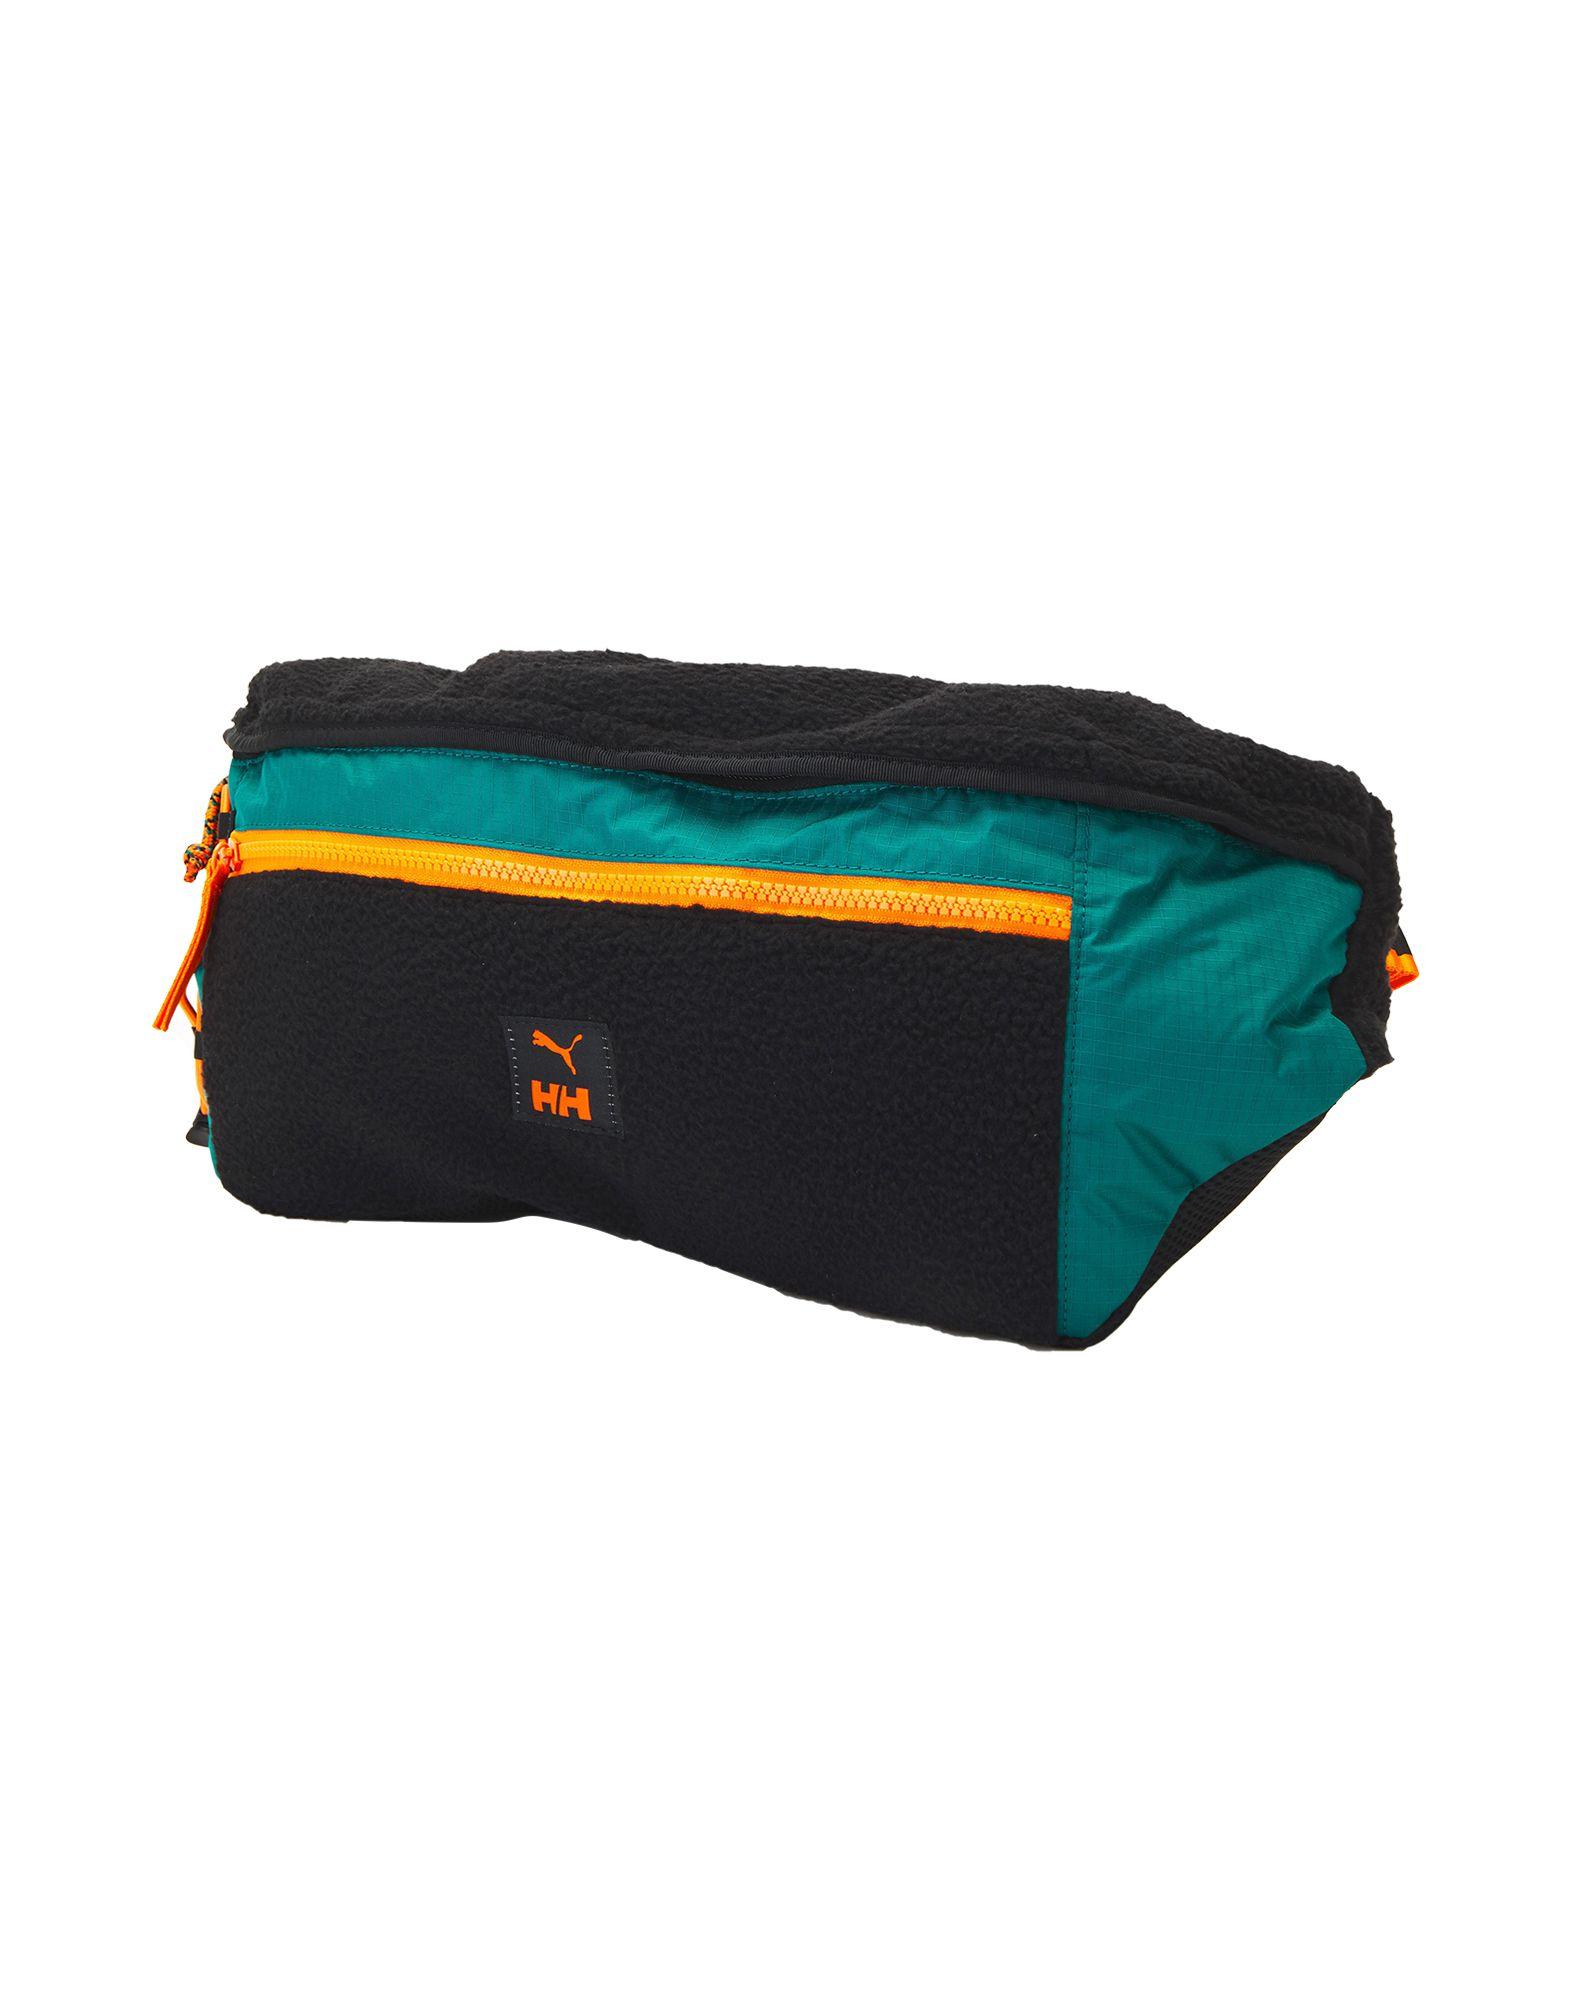 PUMA x HELLY HANSEN Рюкзаки и сумки на пояс термобелье верх helly hansen helly hansen he012ewfqwu8